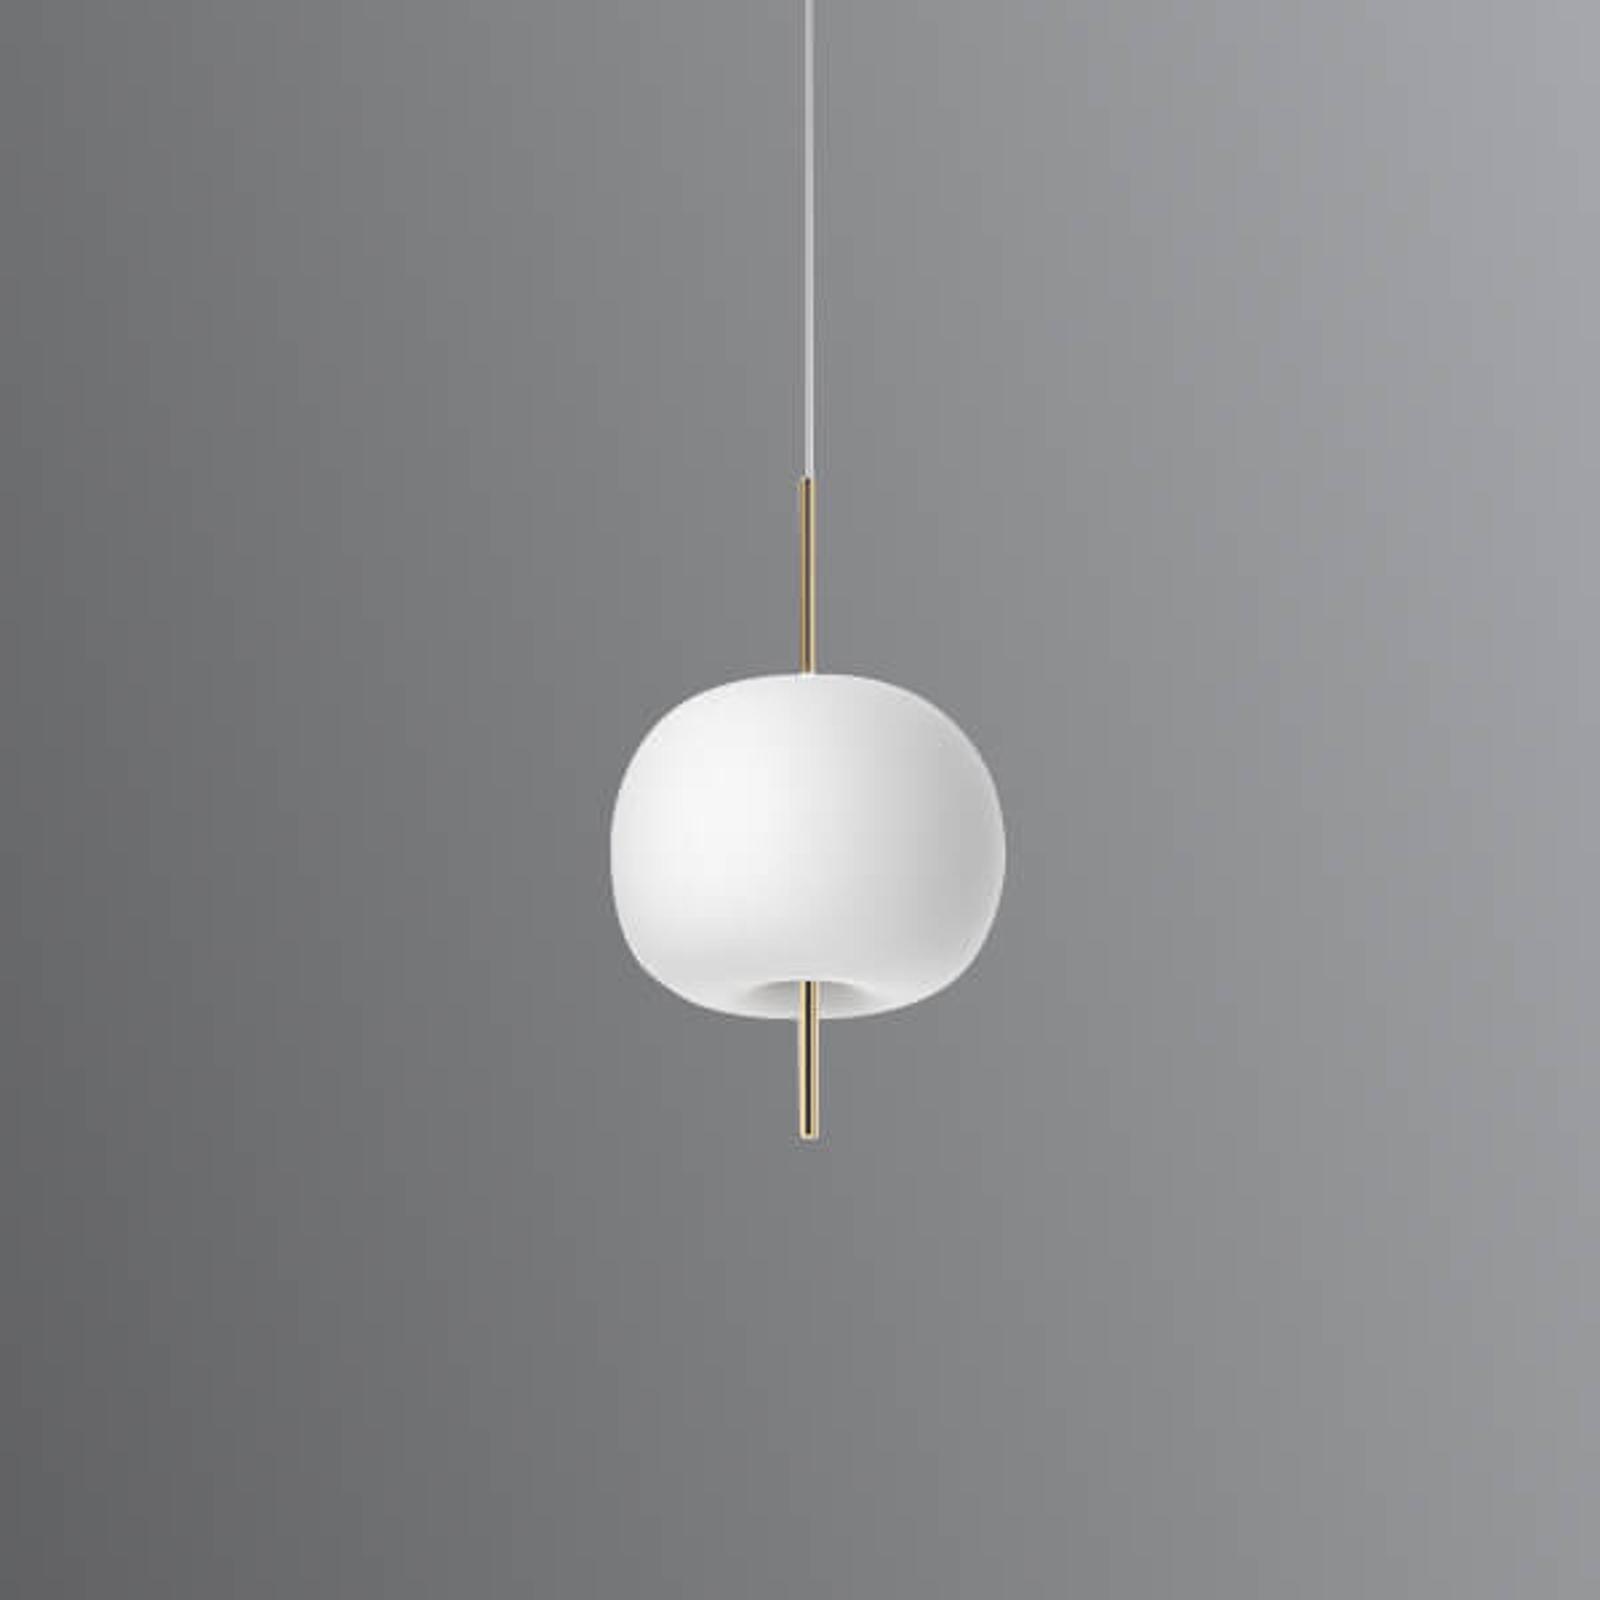 Lampada LED a sospensione di vetro Kushi, 16 cm